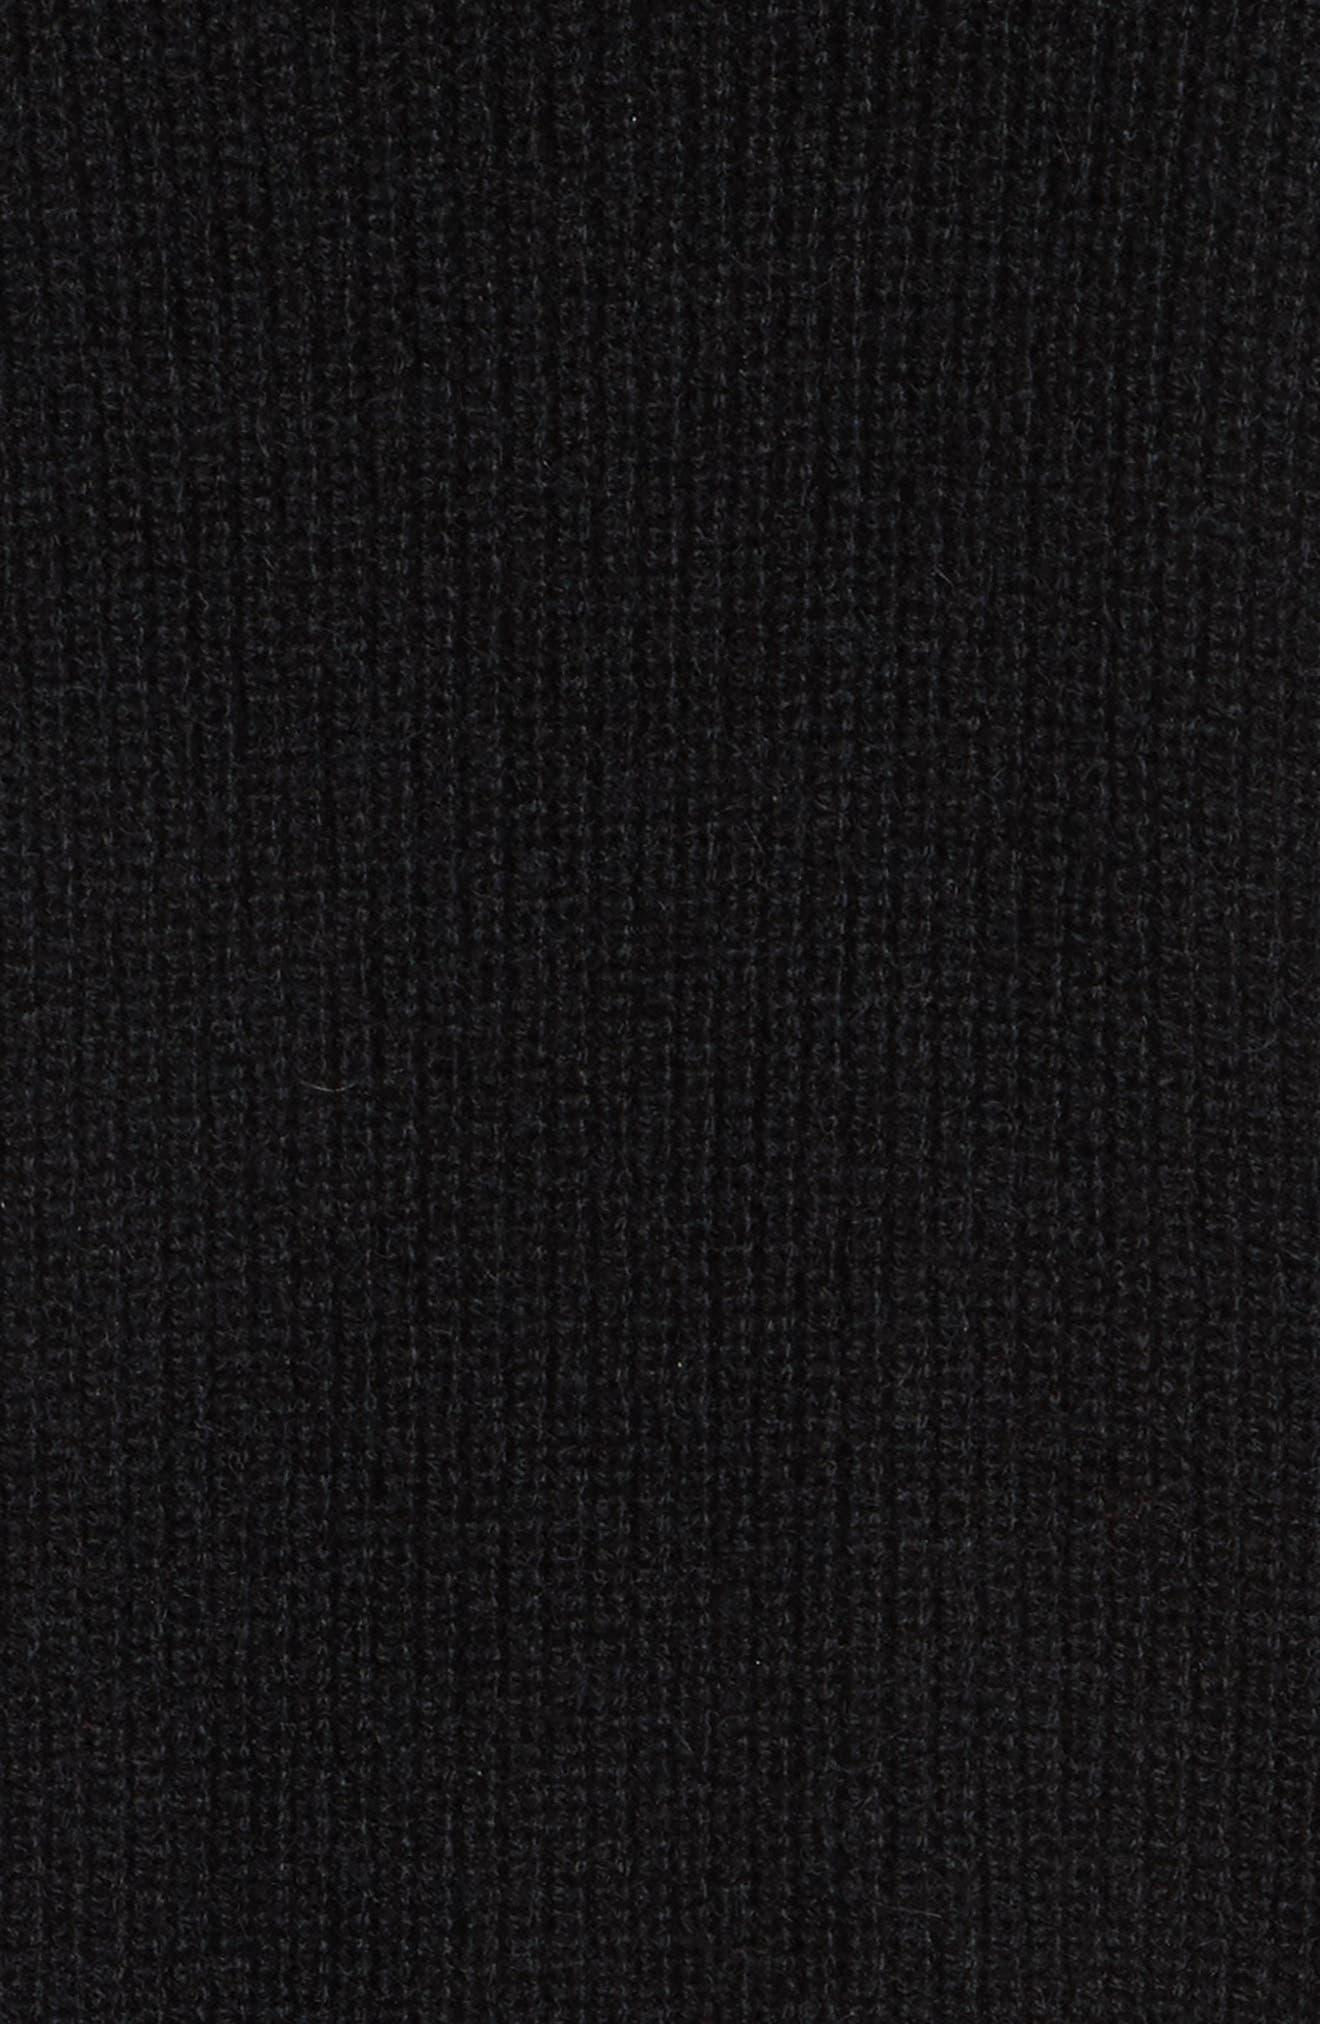 Cold Shoulder Cashmere Pullover,                             Alternate thumbnail 9, color,